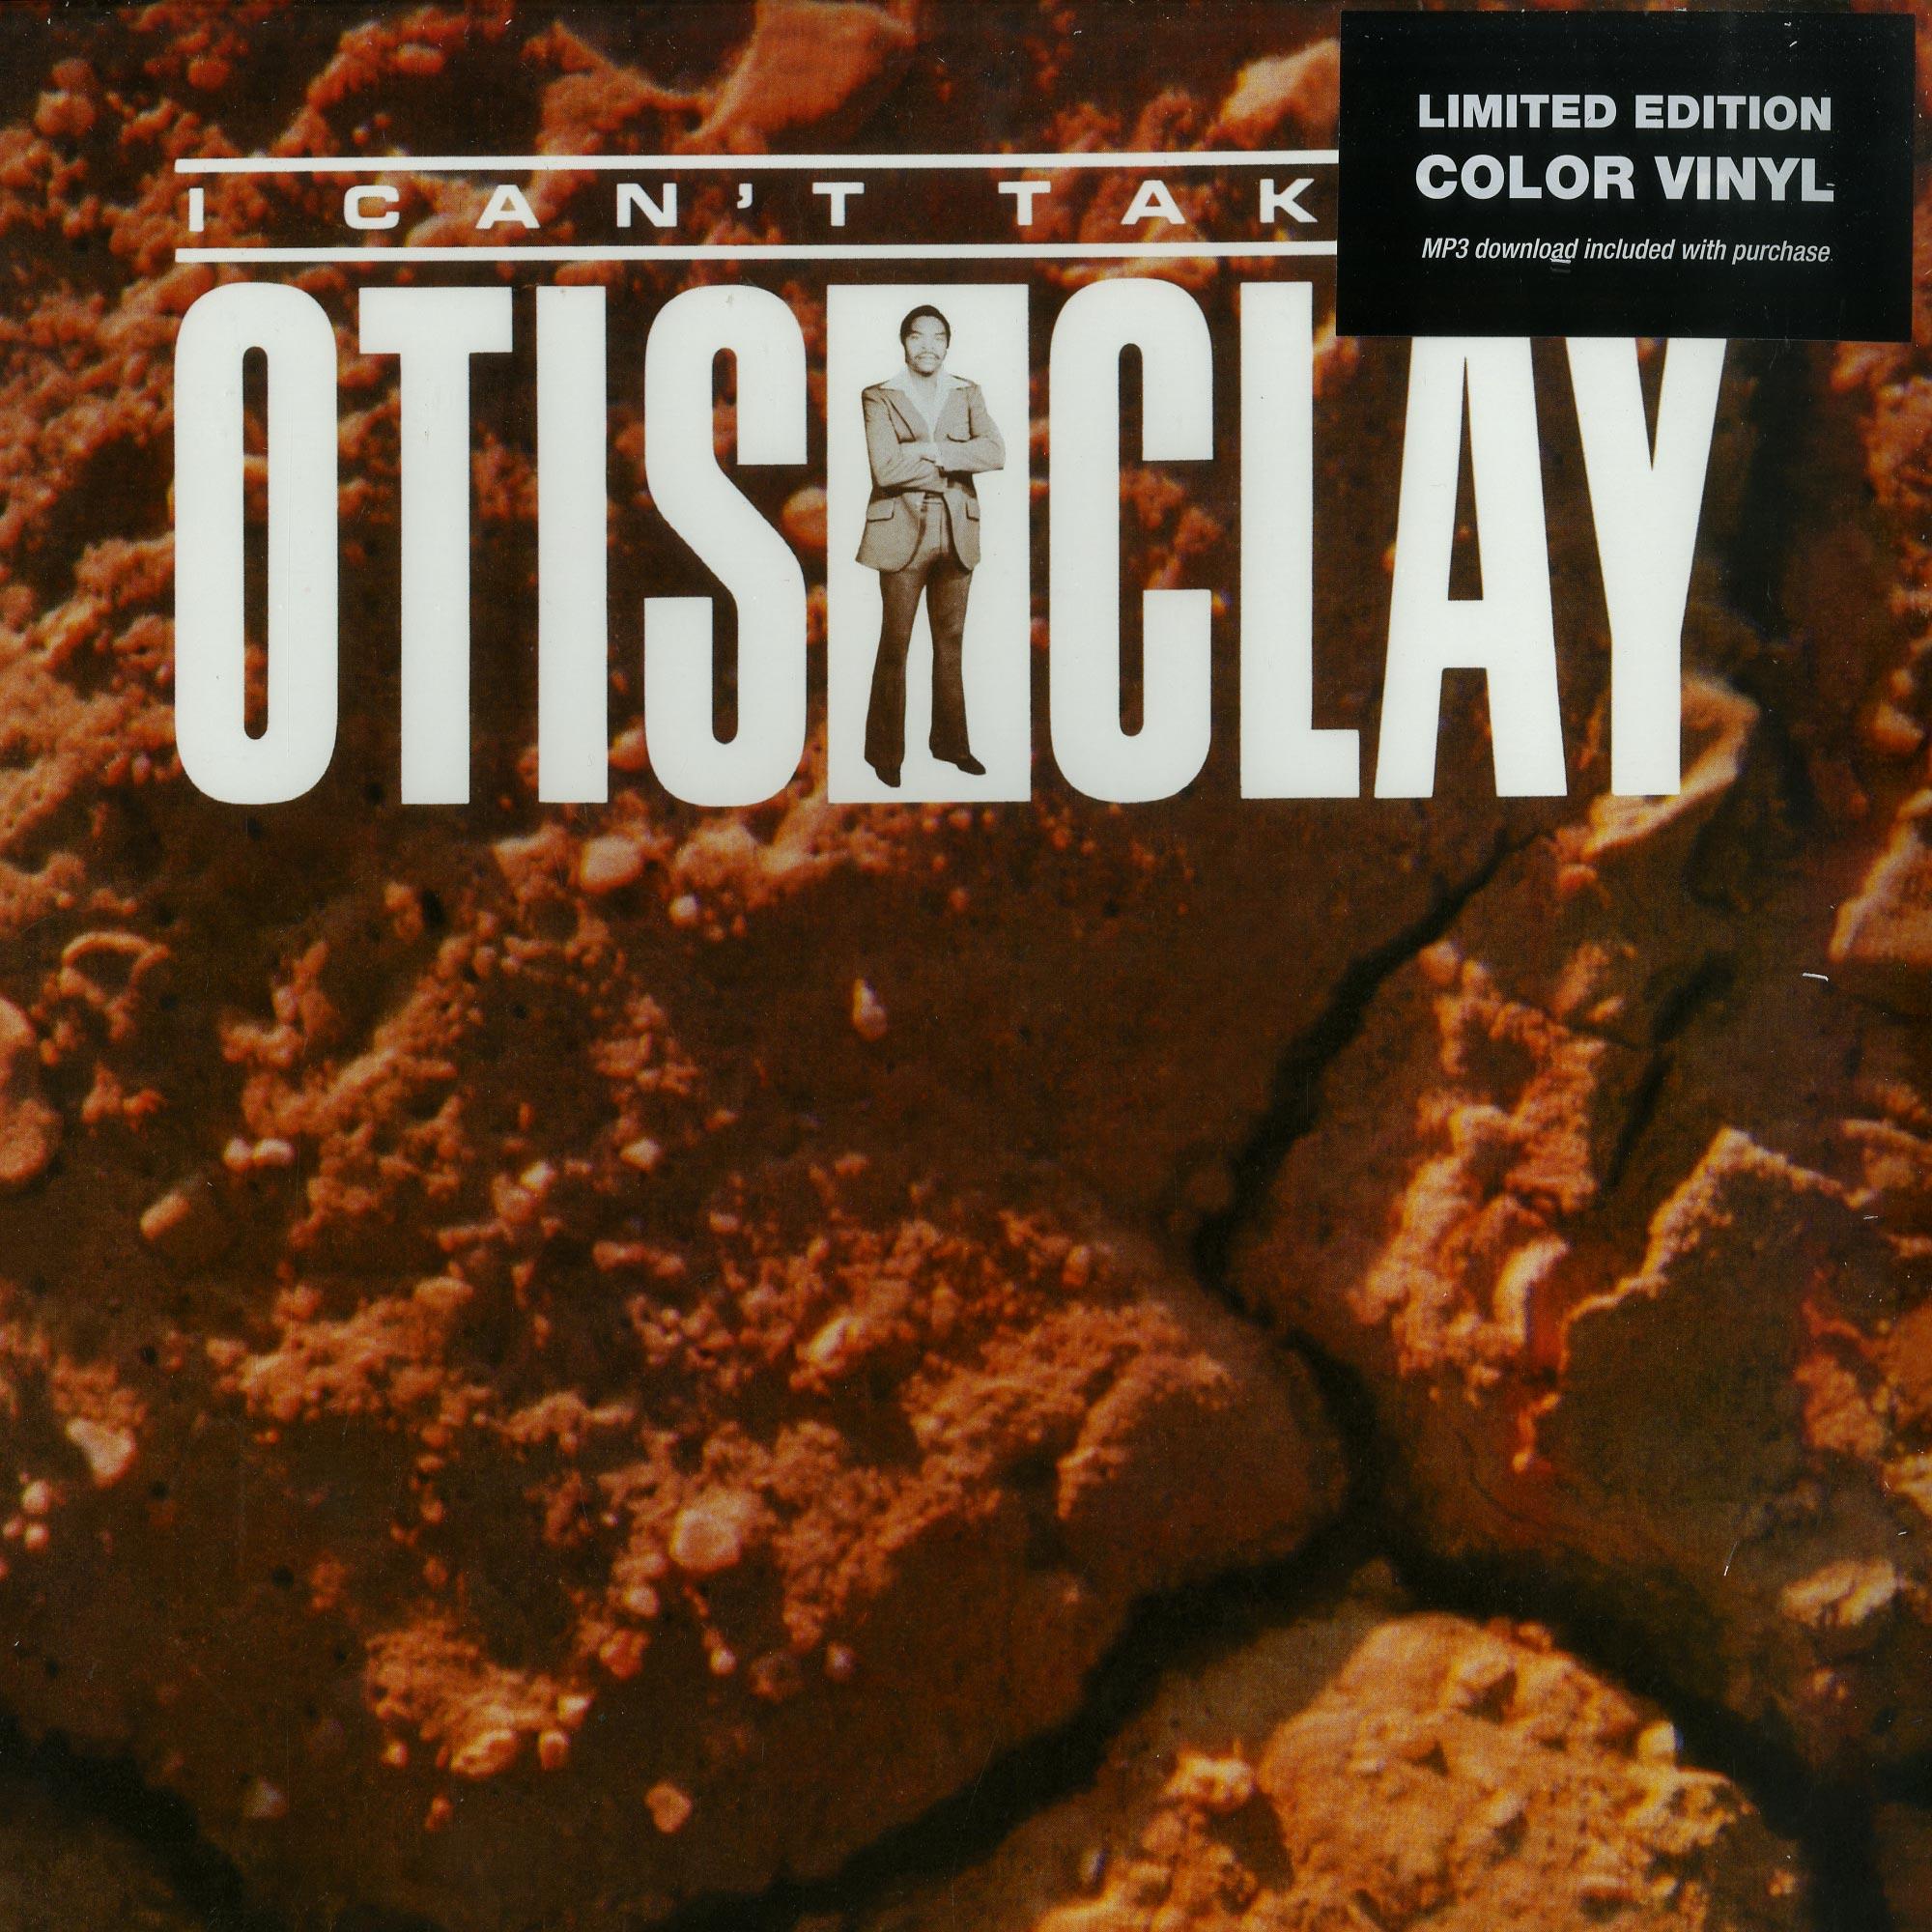 Otis Clay - I CAN T TAKE IT